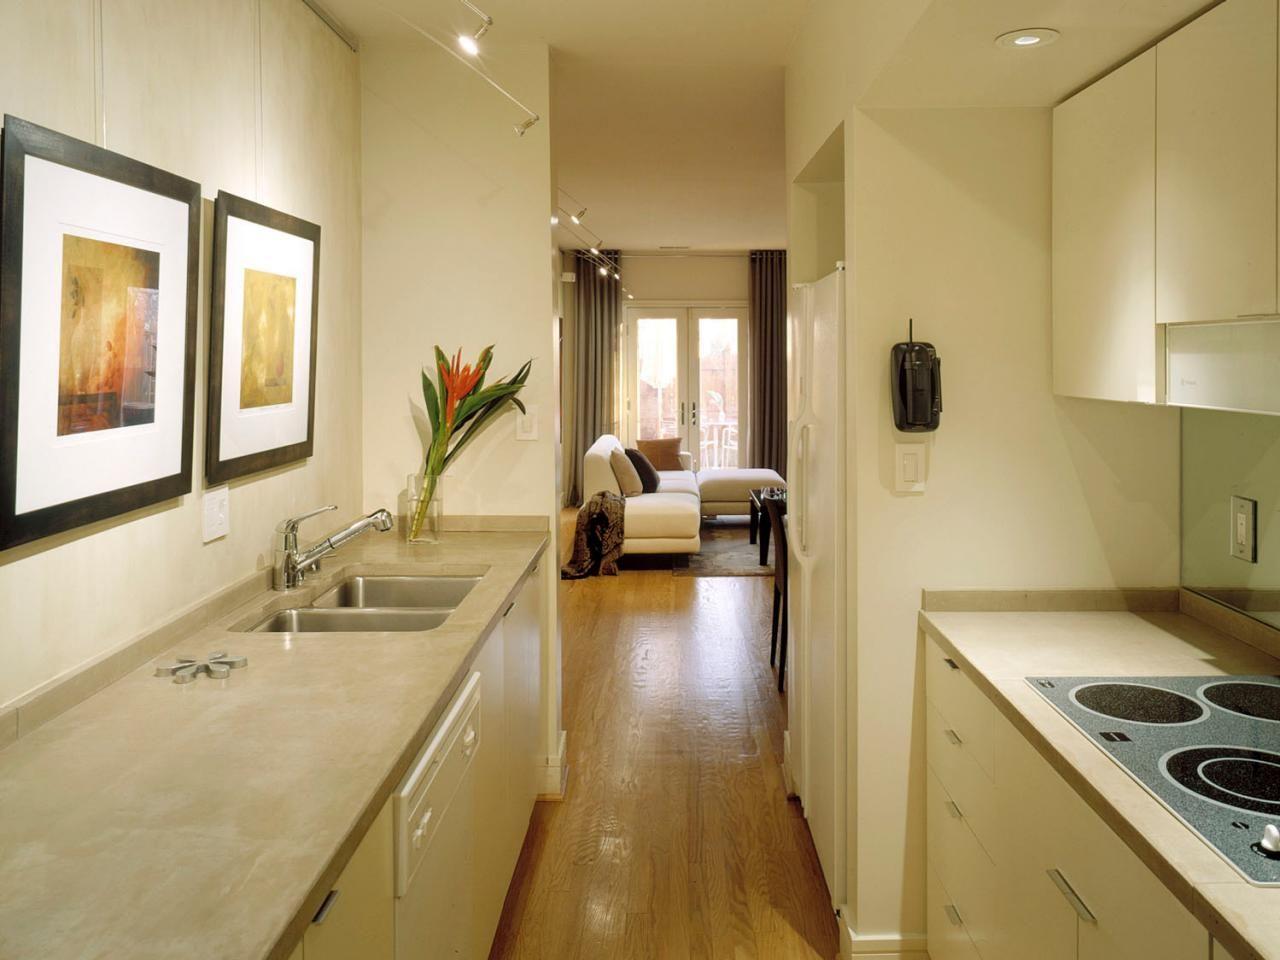 design ideas for galley kitchens. Galley Kitchen Designs  Style Kitchen Kitchens And